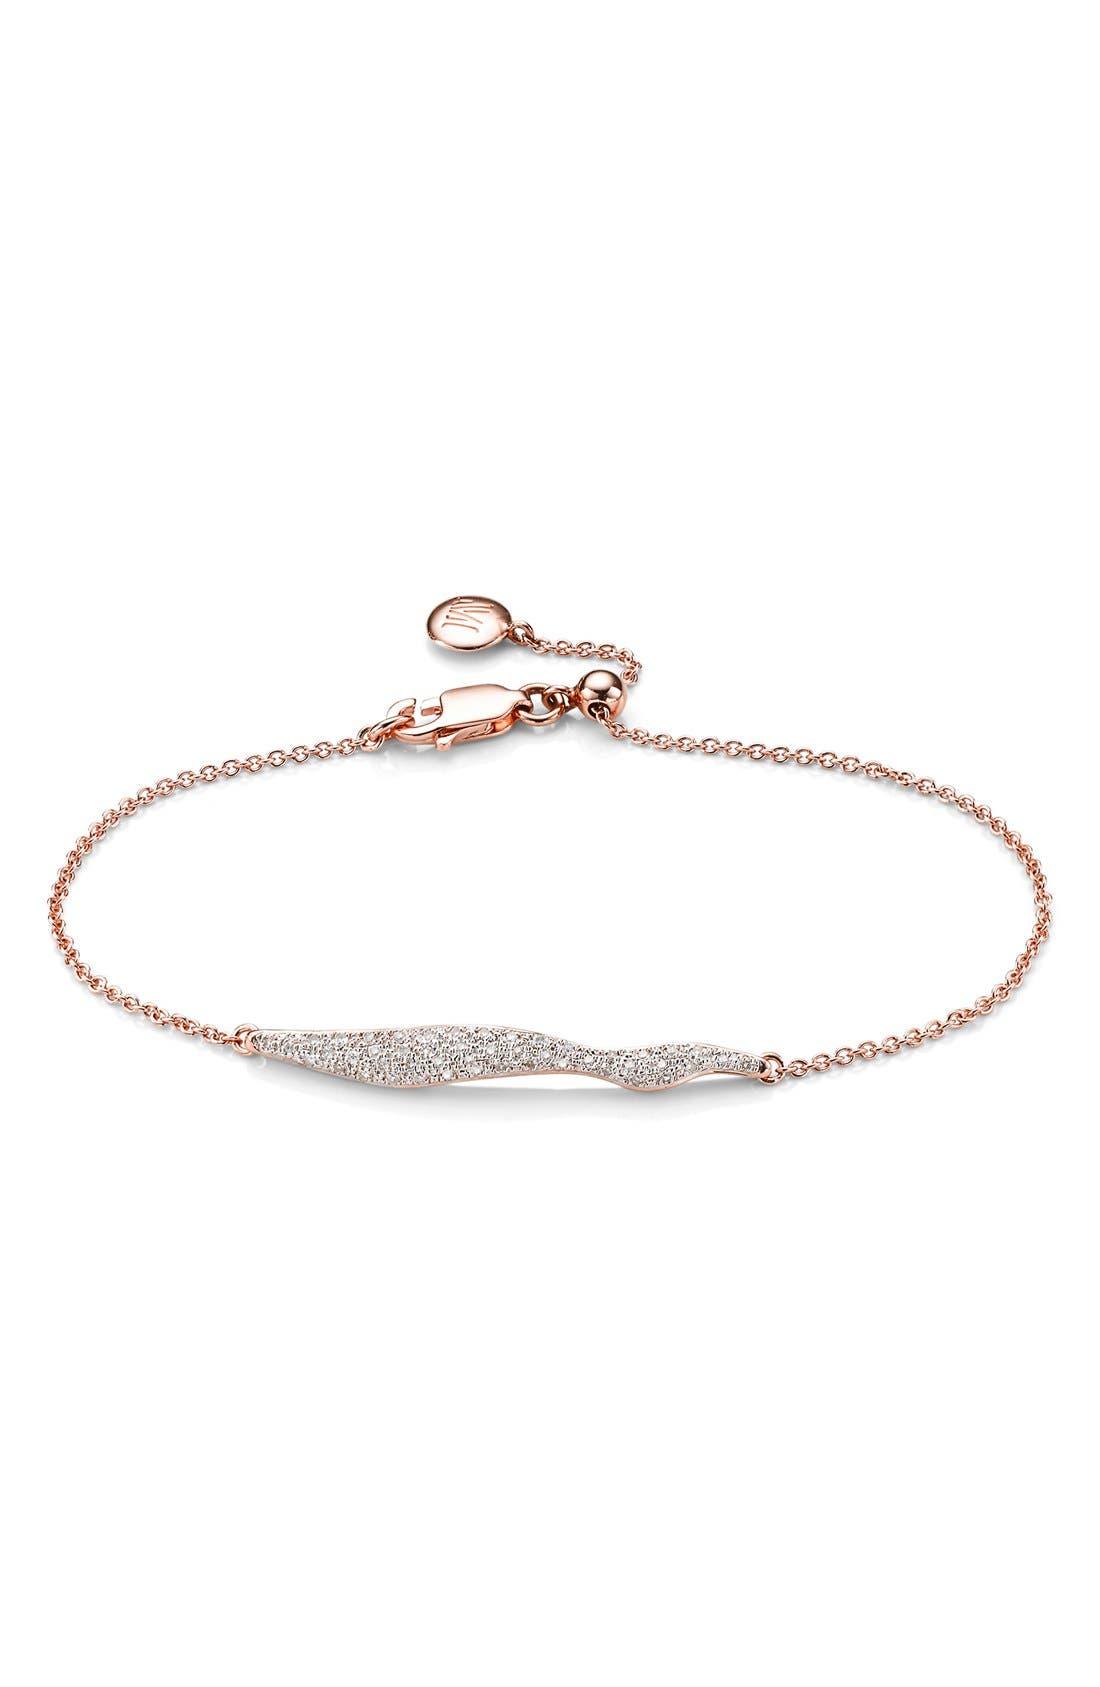 Monica Vinader 'Riva' Wave Diamond Charm Bracelet